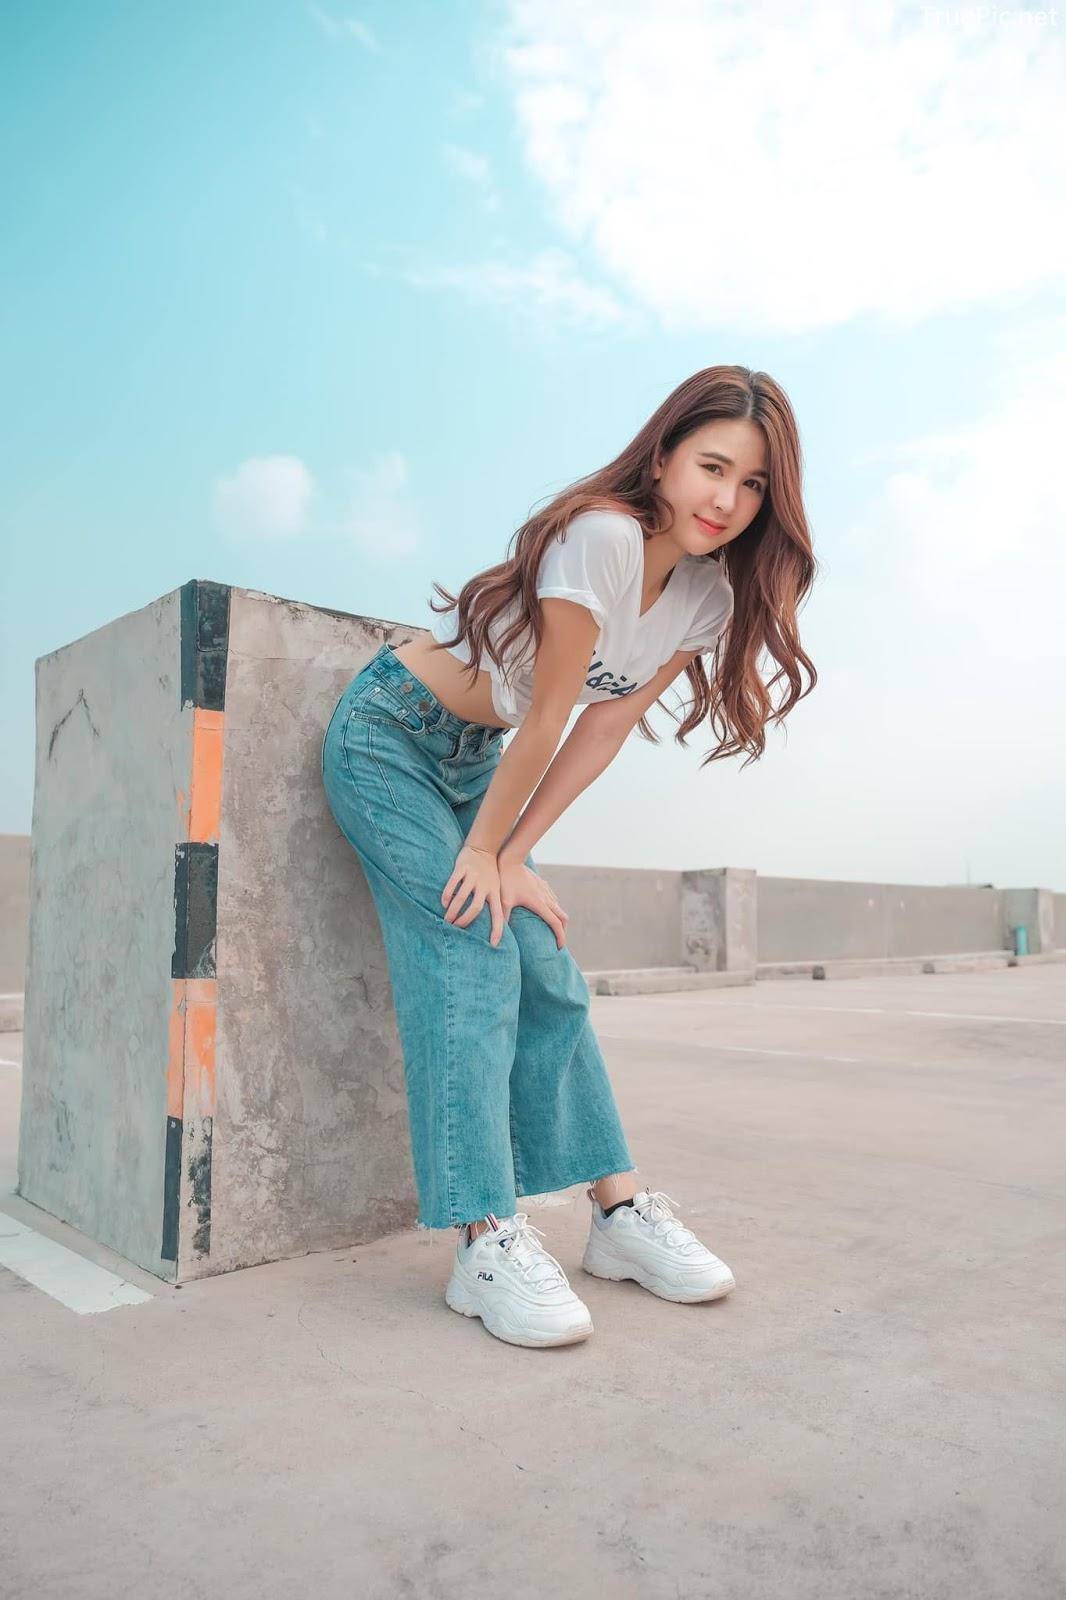 Thailan cute model - Supansa Yoopradit (Lorpor) - The terrace is full of windy afternoon - Picture 7